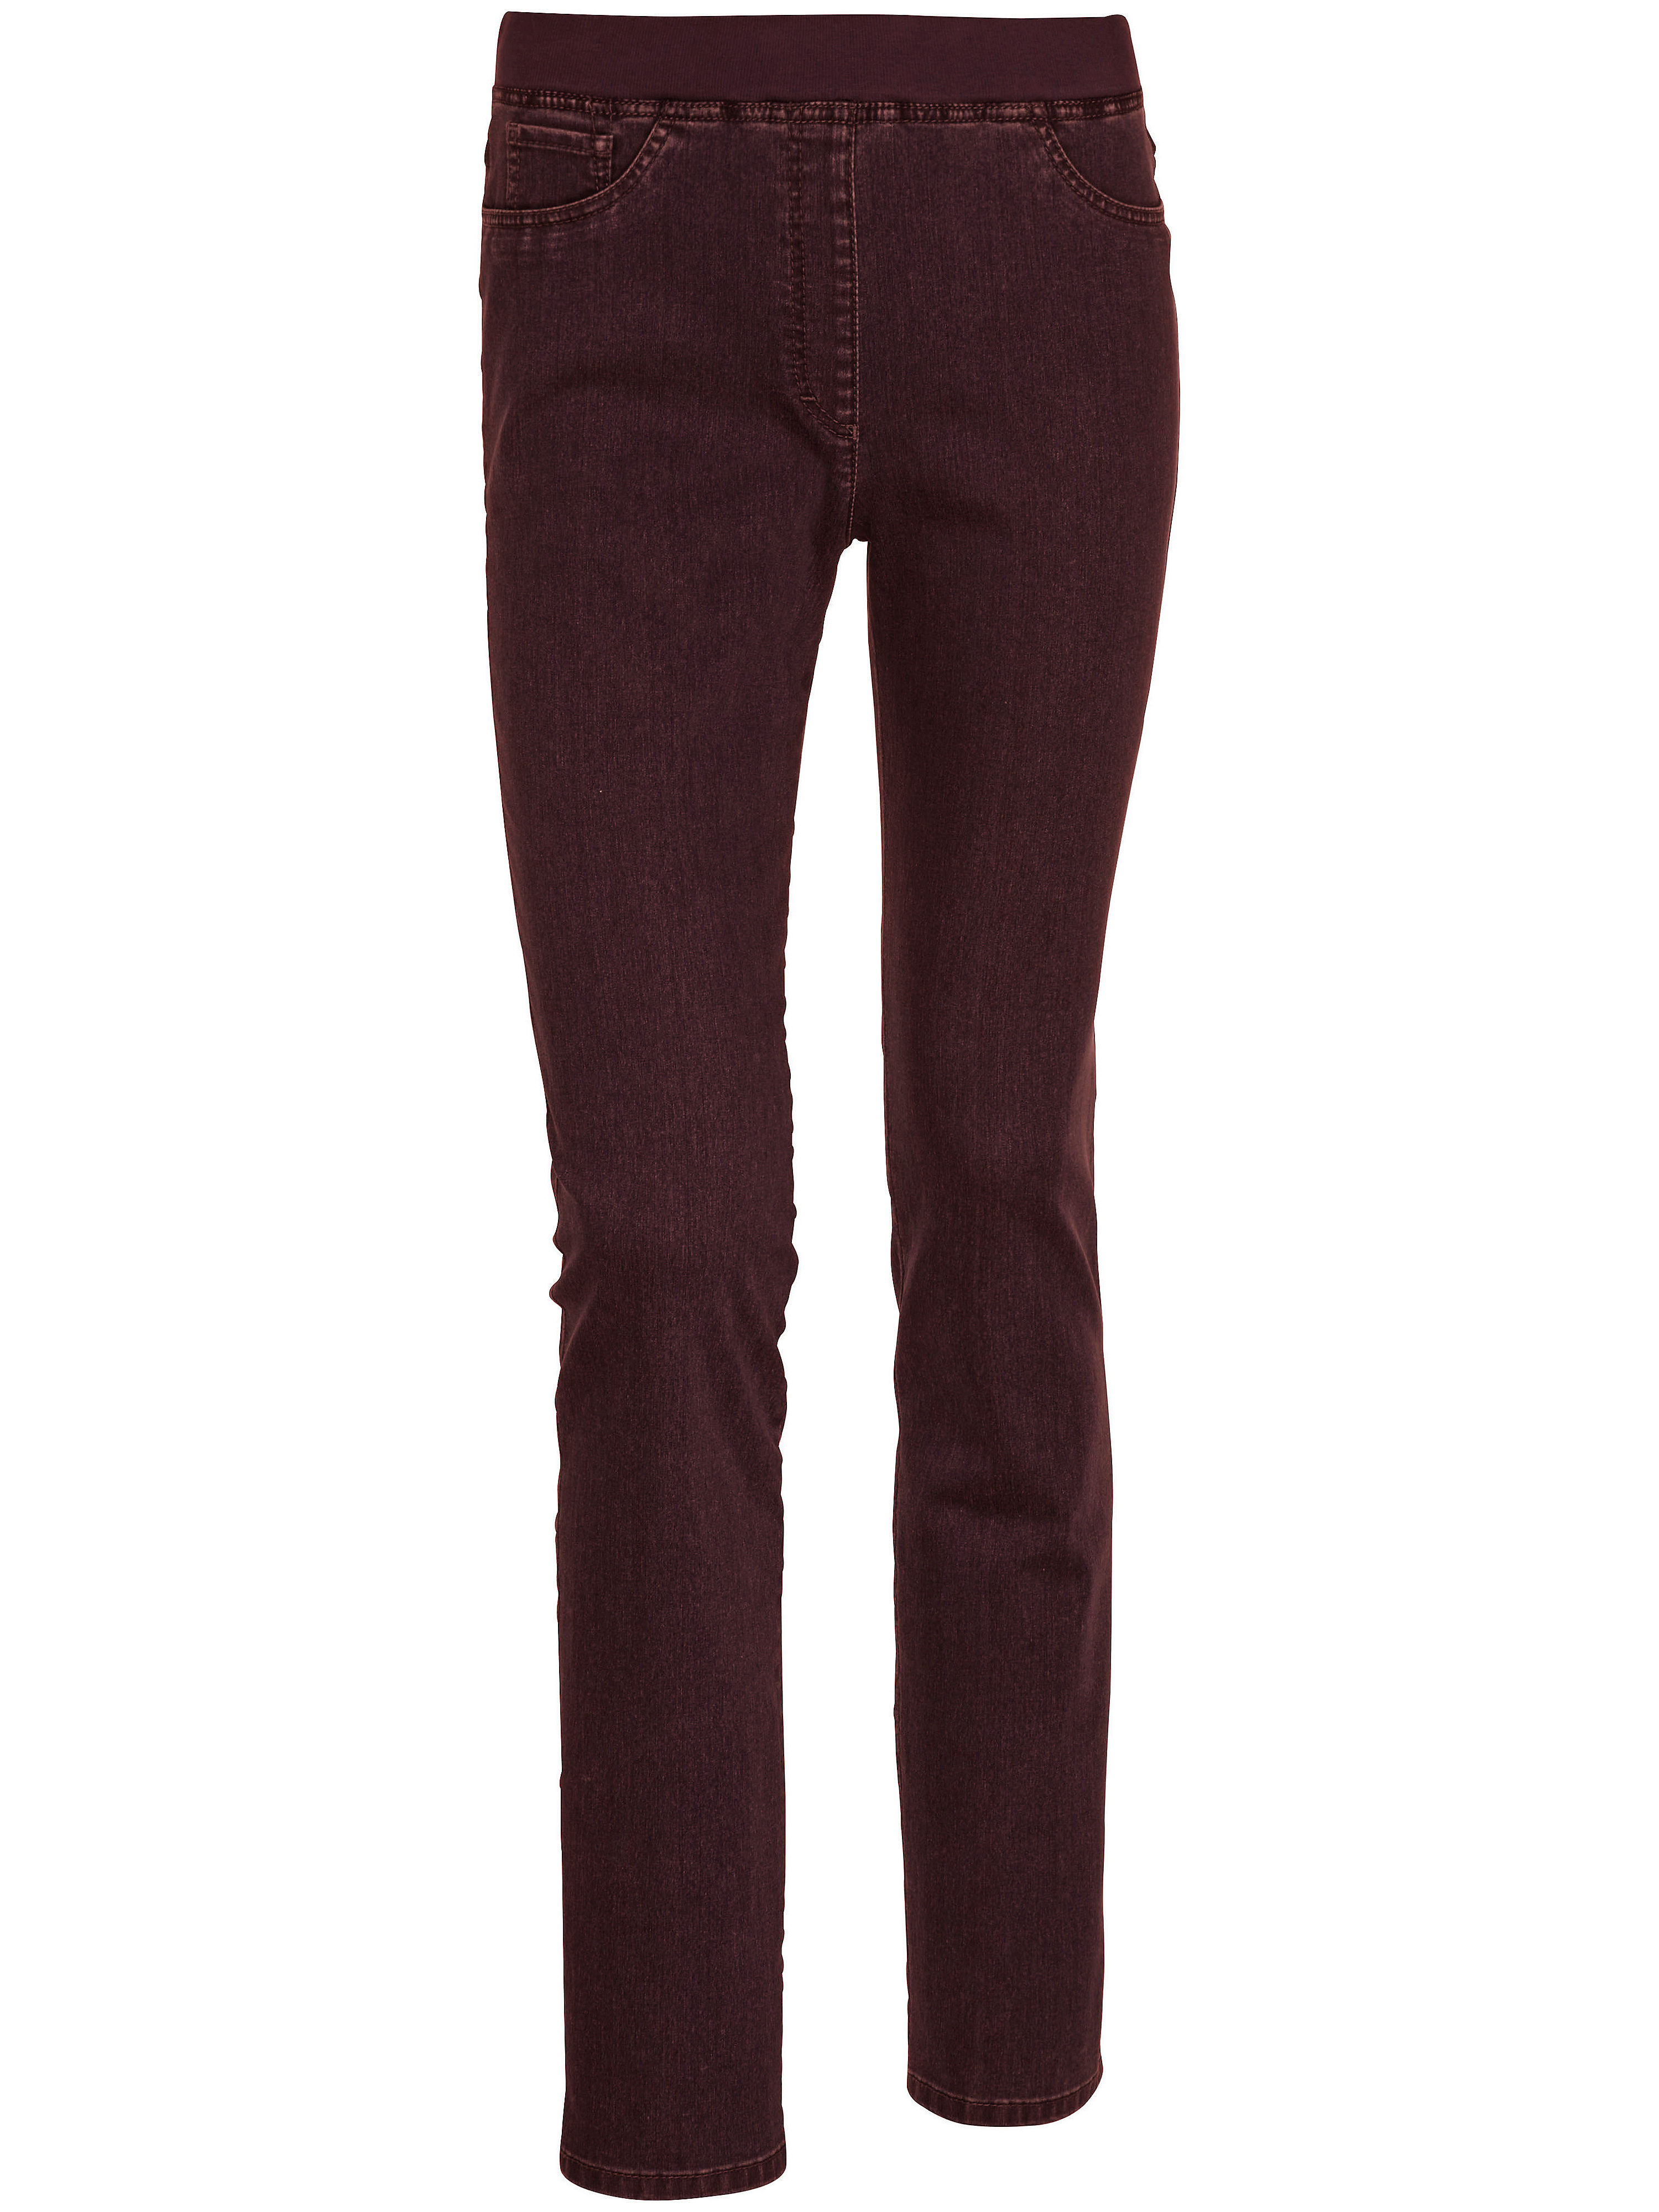 Image of   'Comfort Plus'- jeans, Raphaela by Brax - CARINA Fra Raphaela by Brax rød